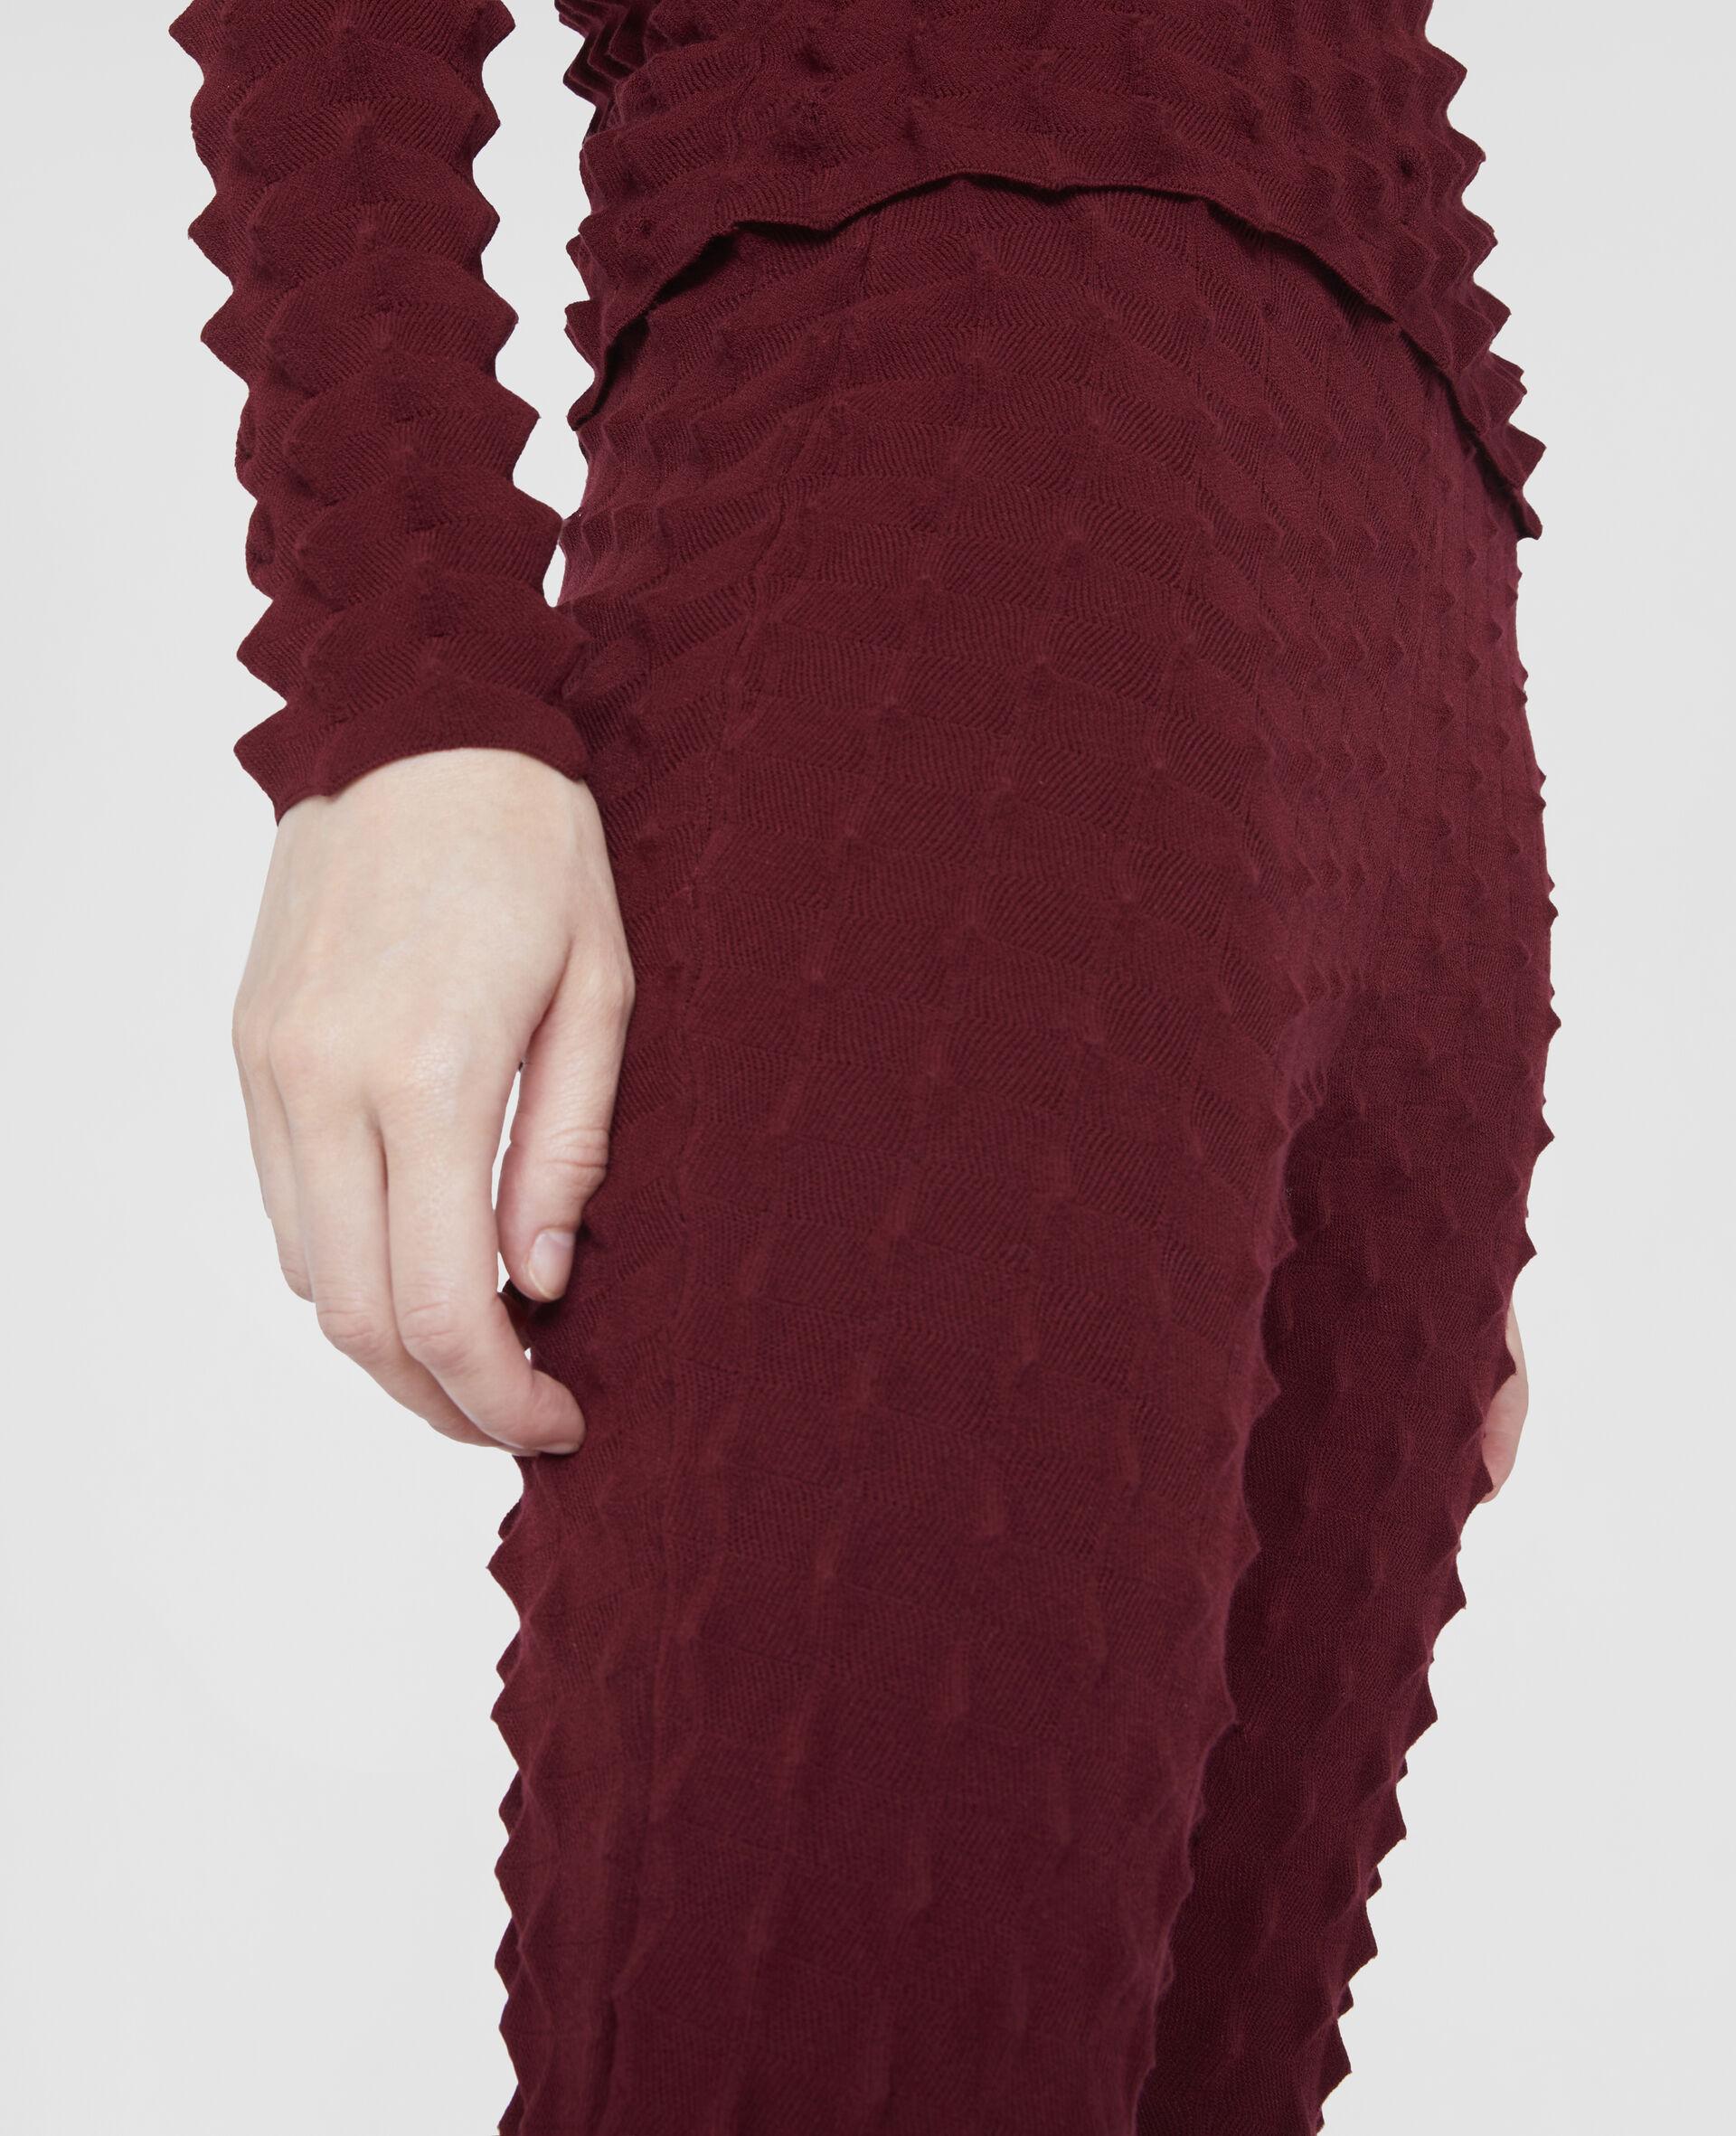 Pantaloni Light Popcorn-Rosso-large image number 3